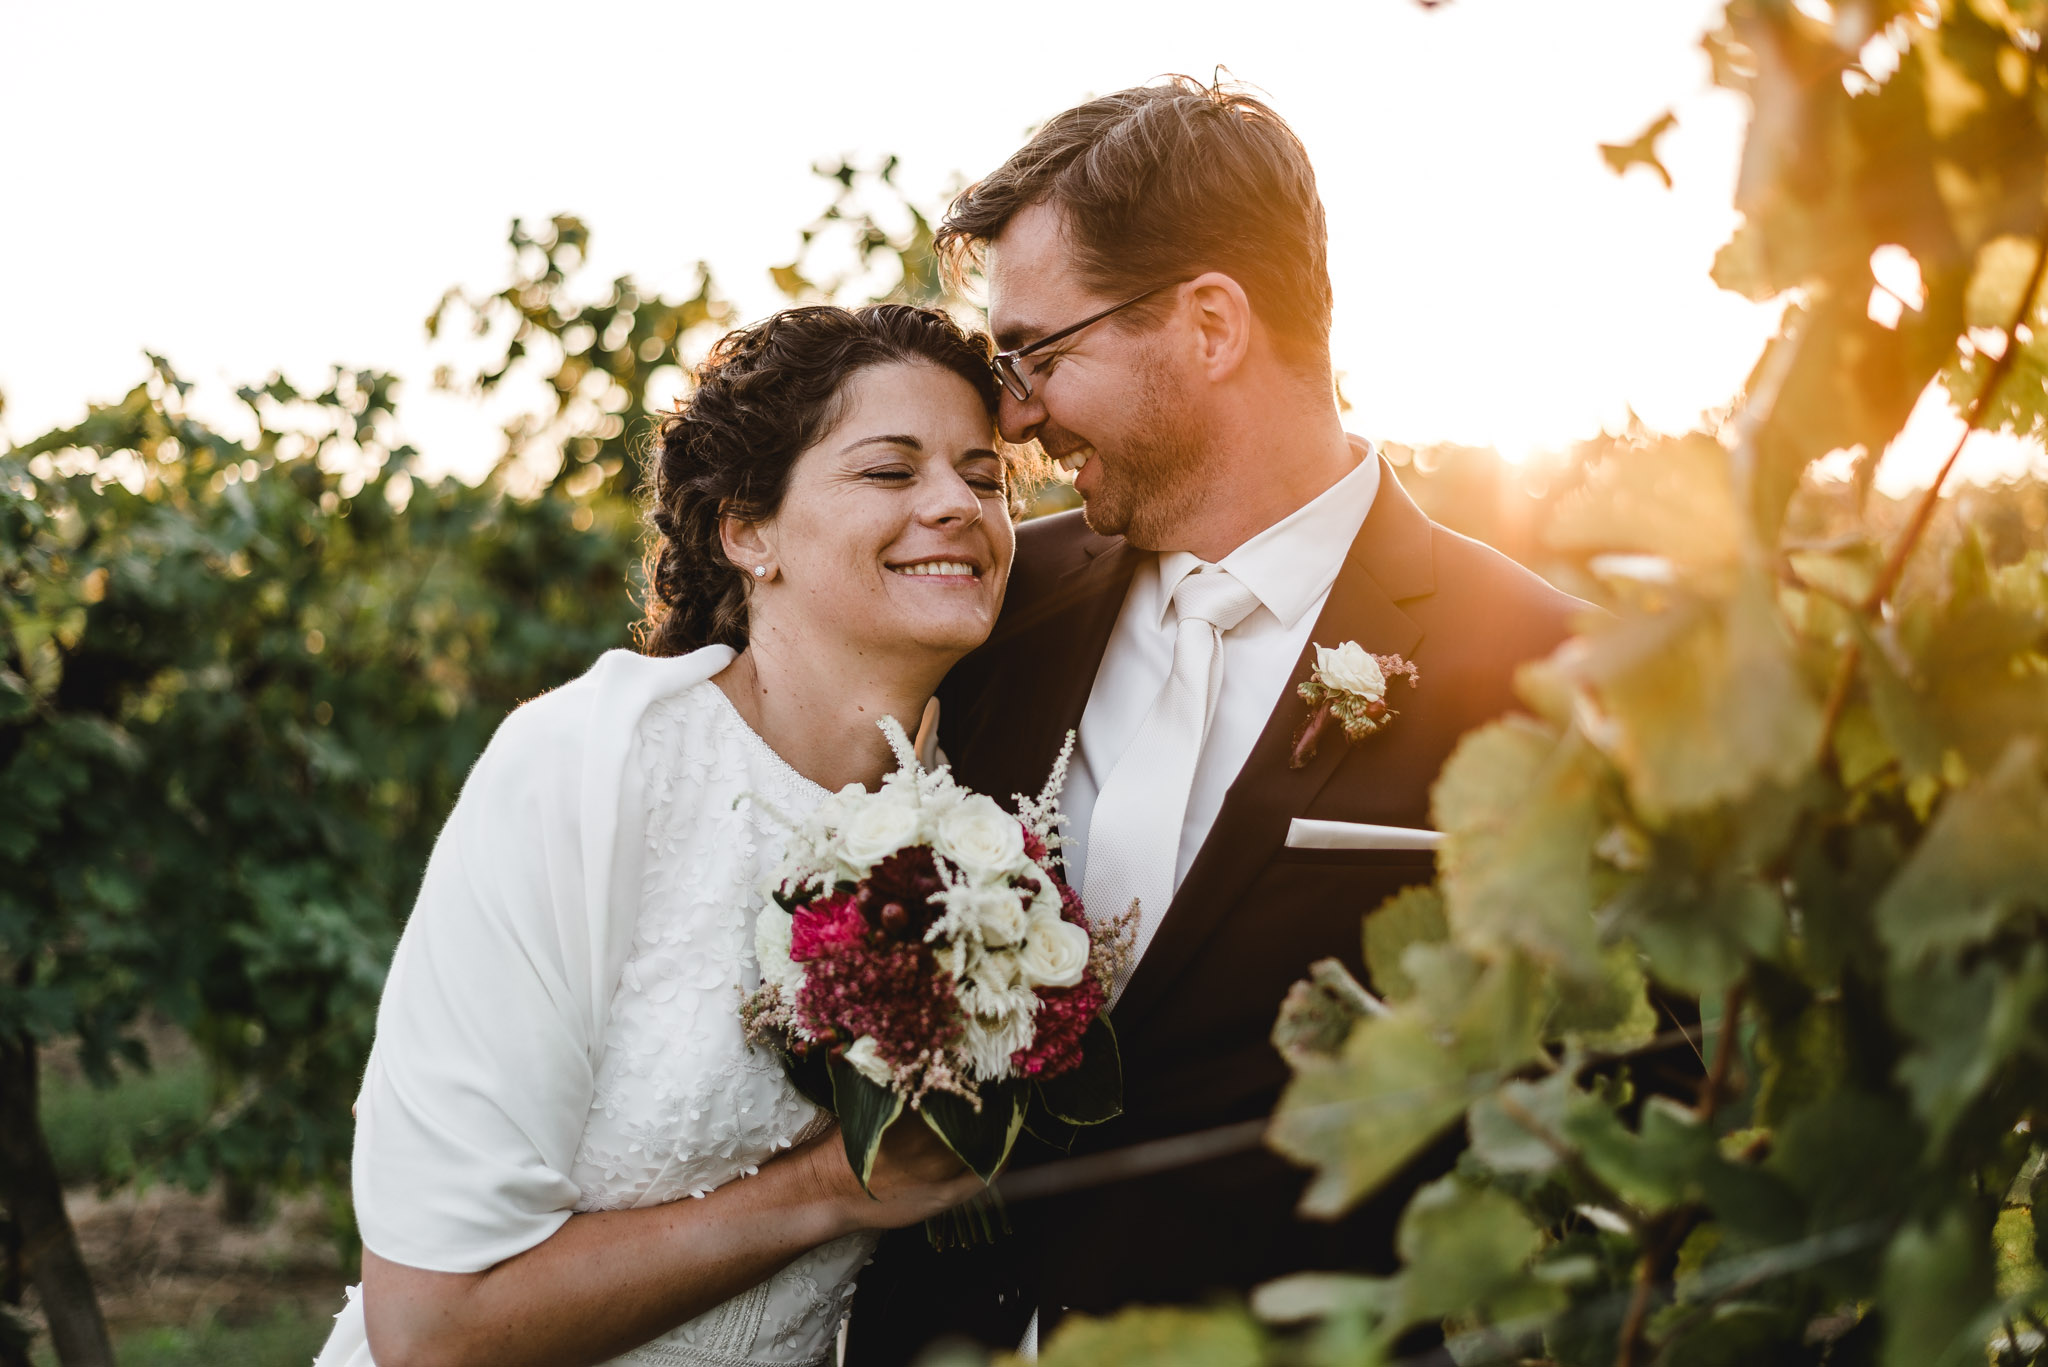 Bernd Grega Hochzeitsfotografie